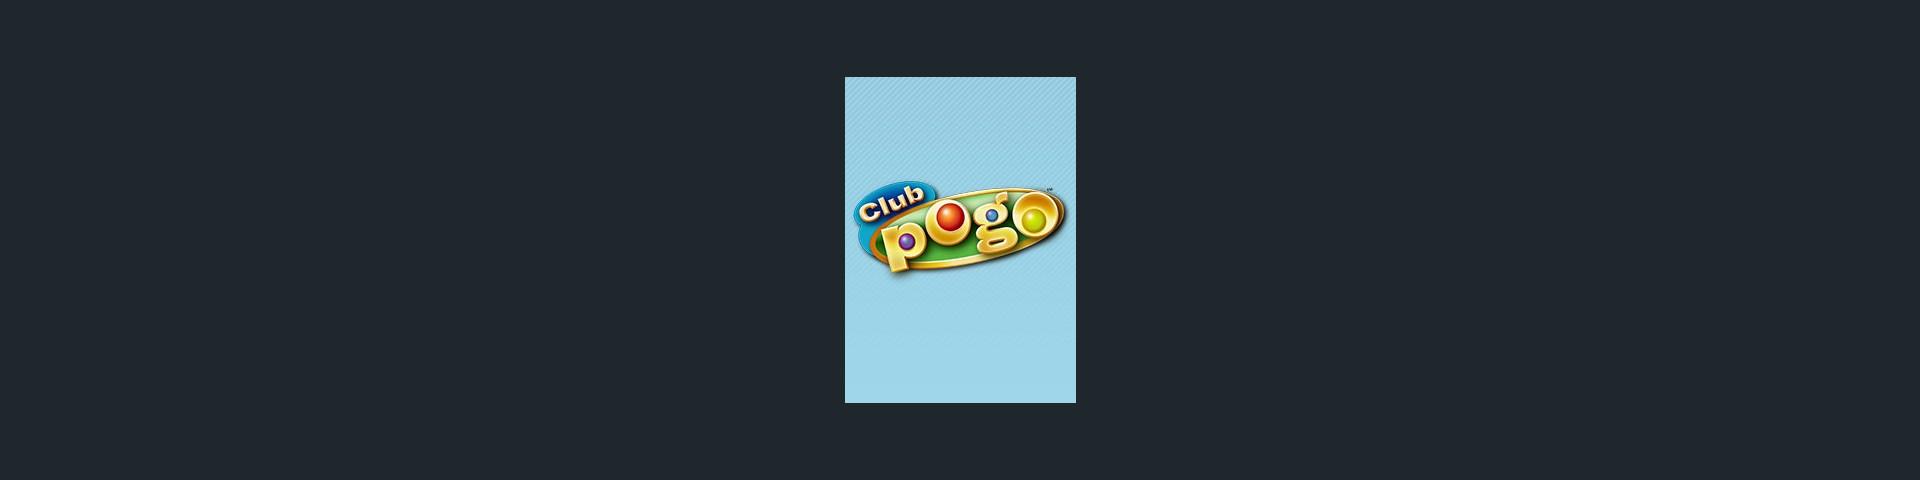 play club pogo games